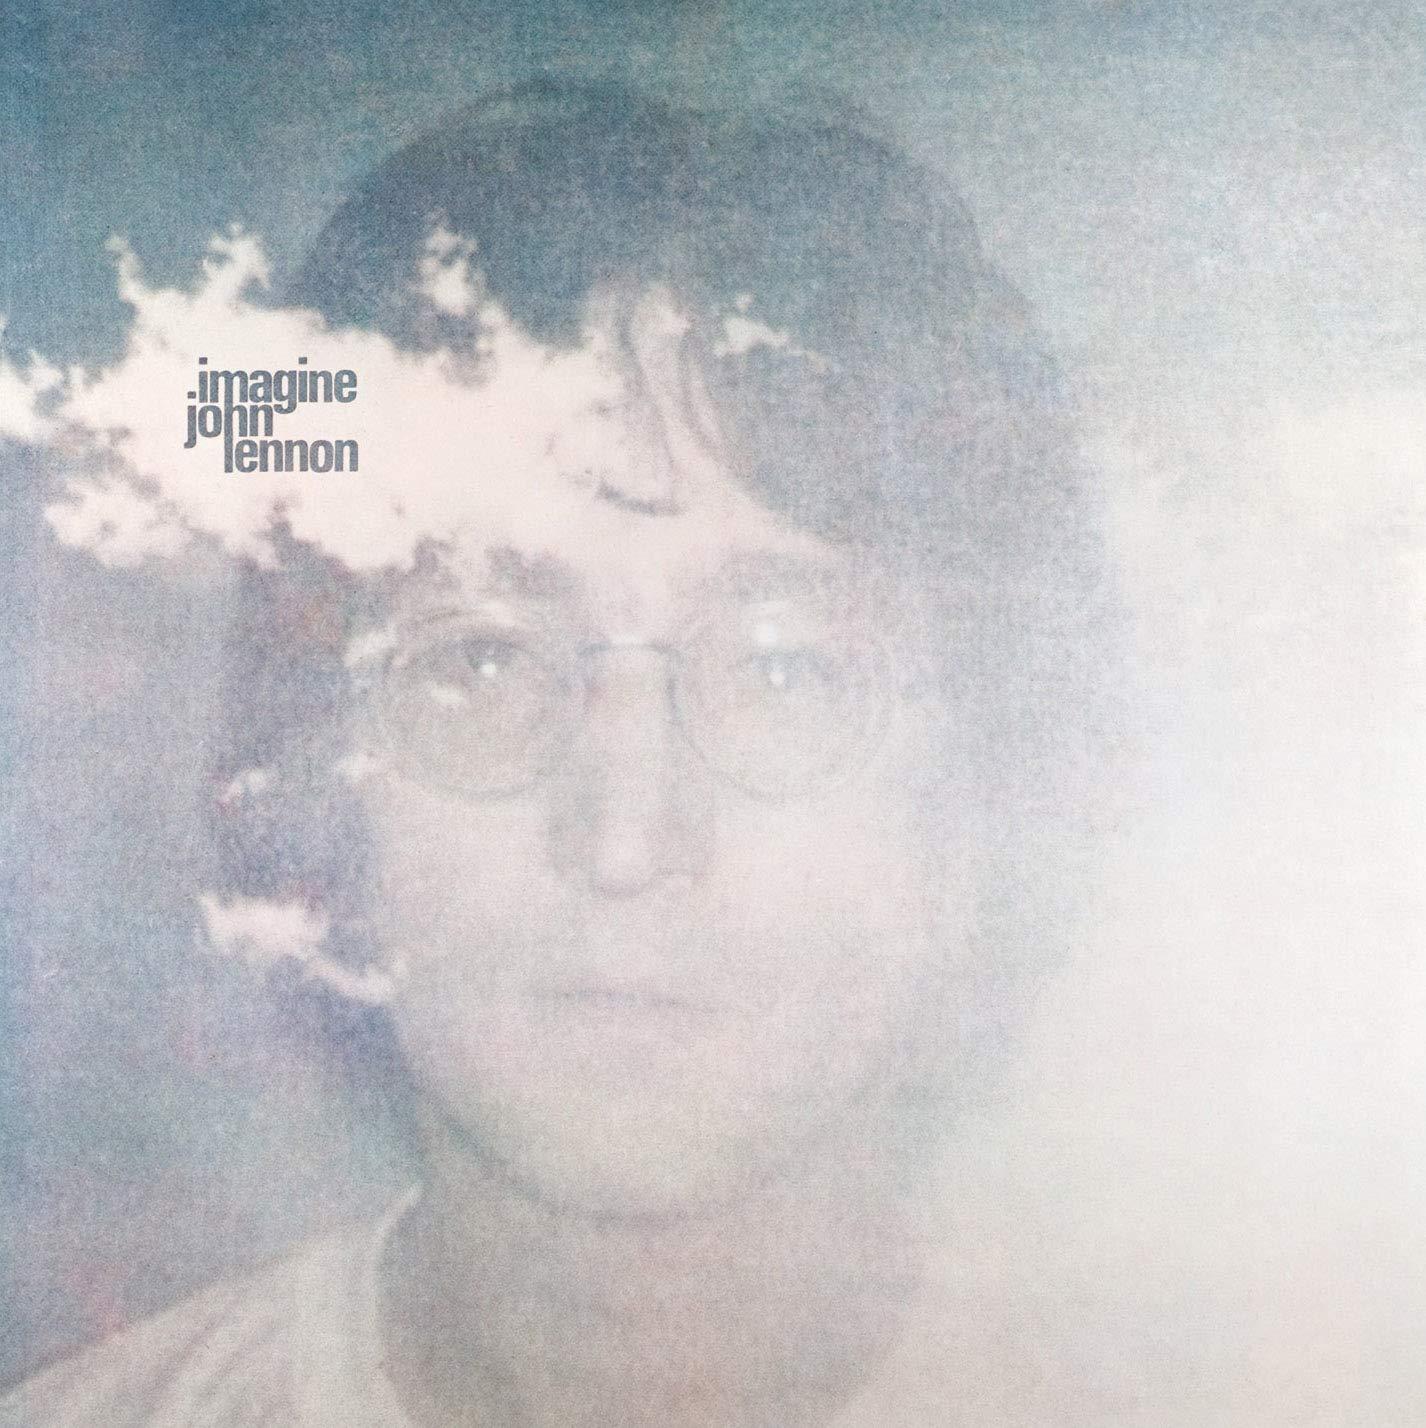 Vinilo : John Lennon - Imagine: The Ultimate Mixes (Remixes)